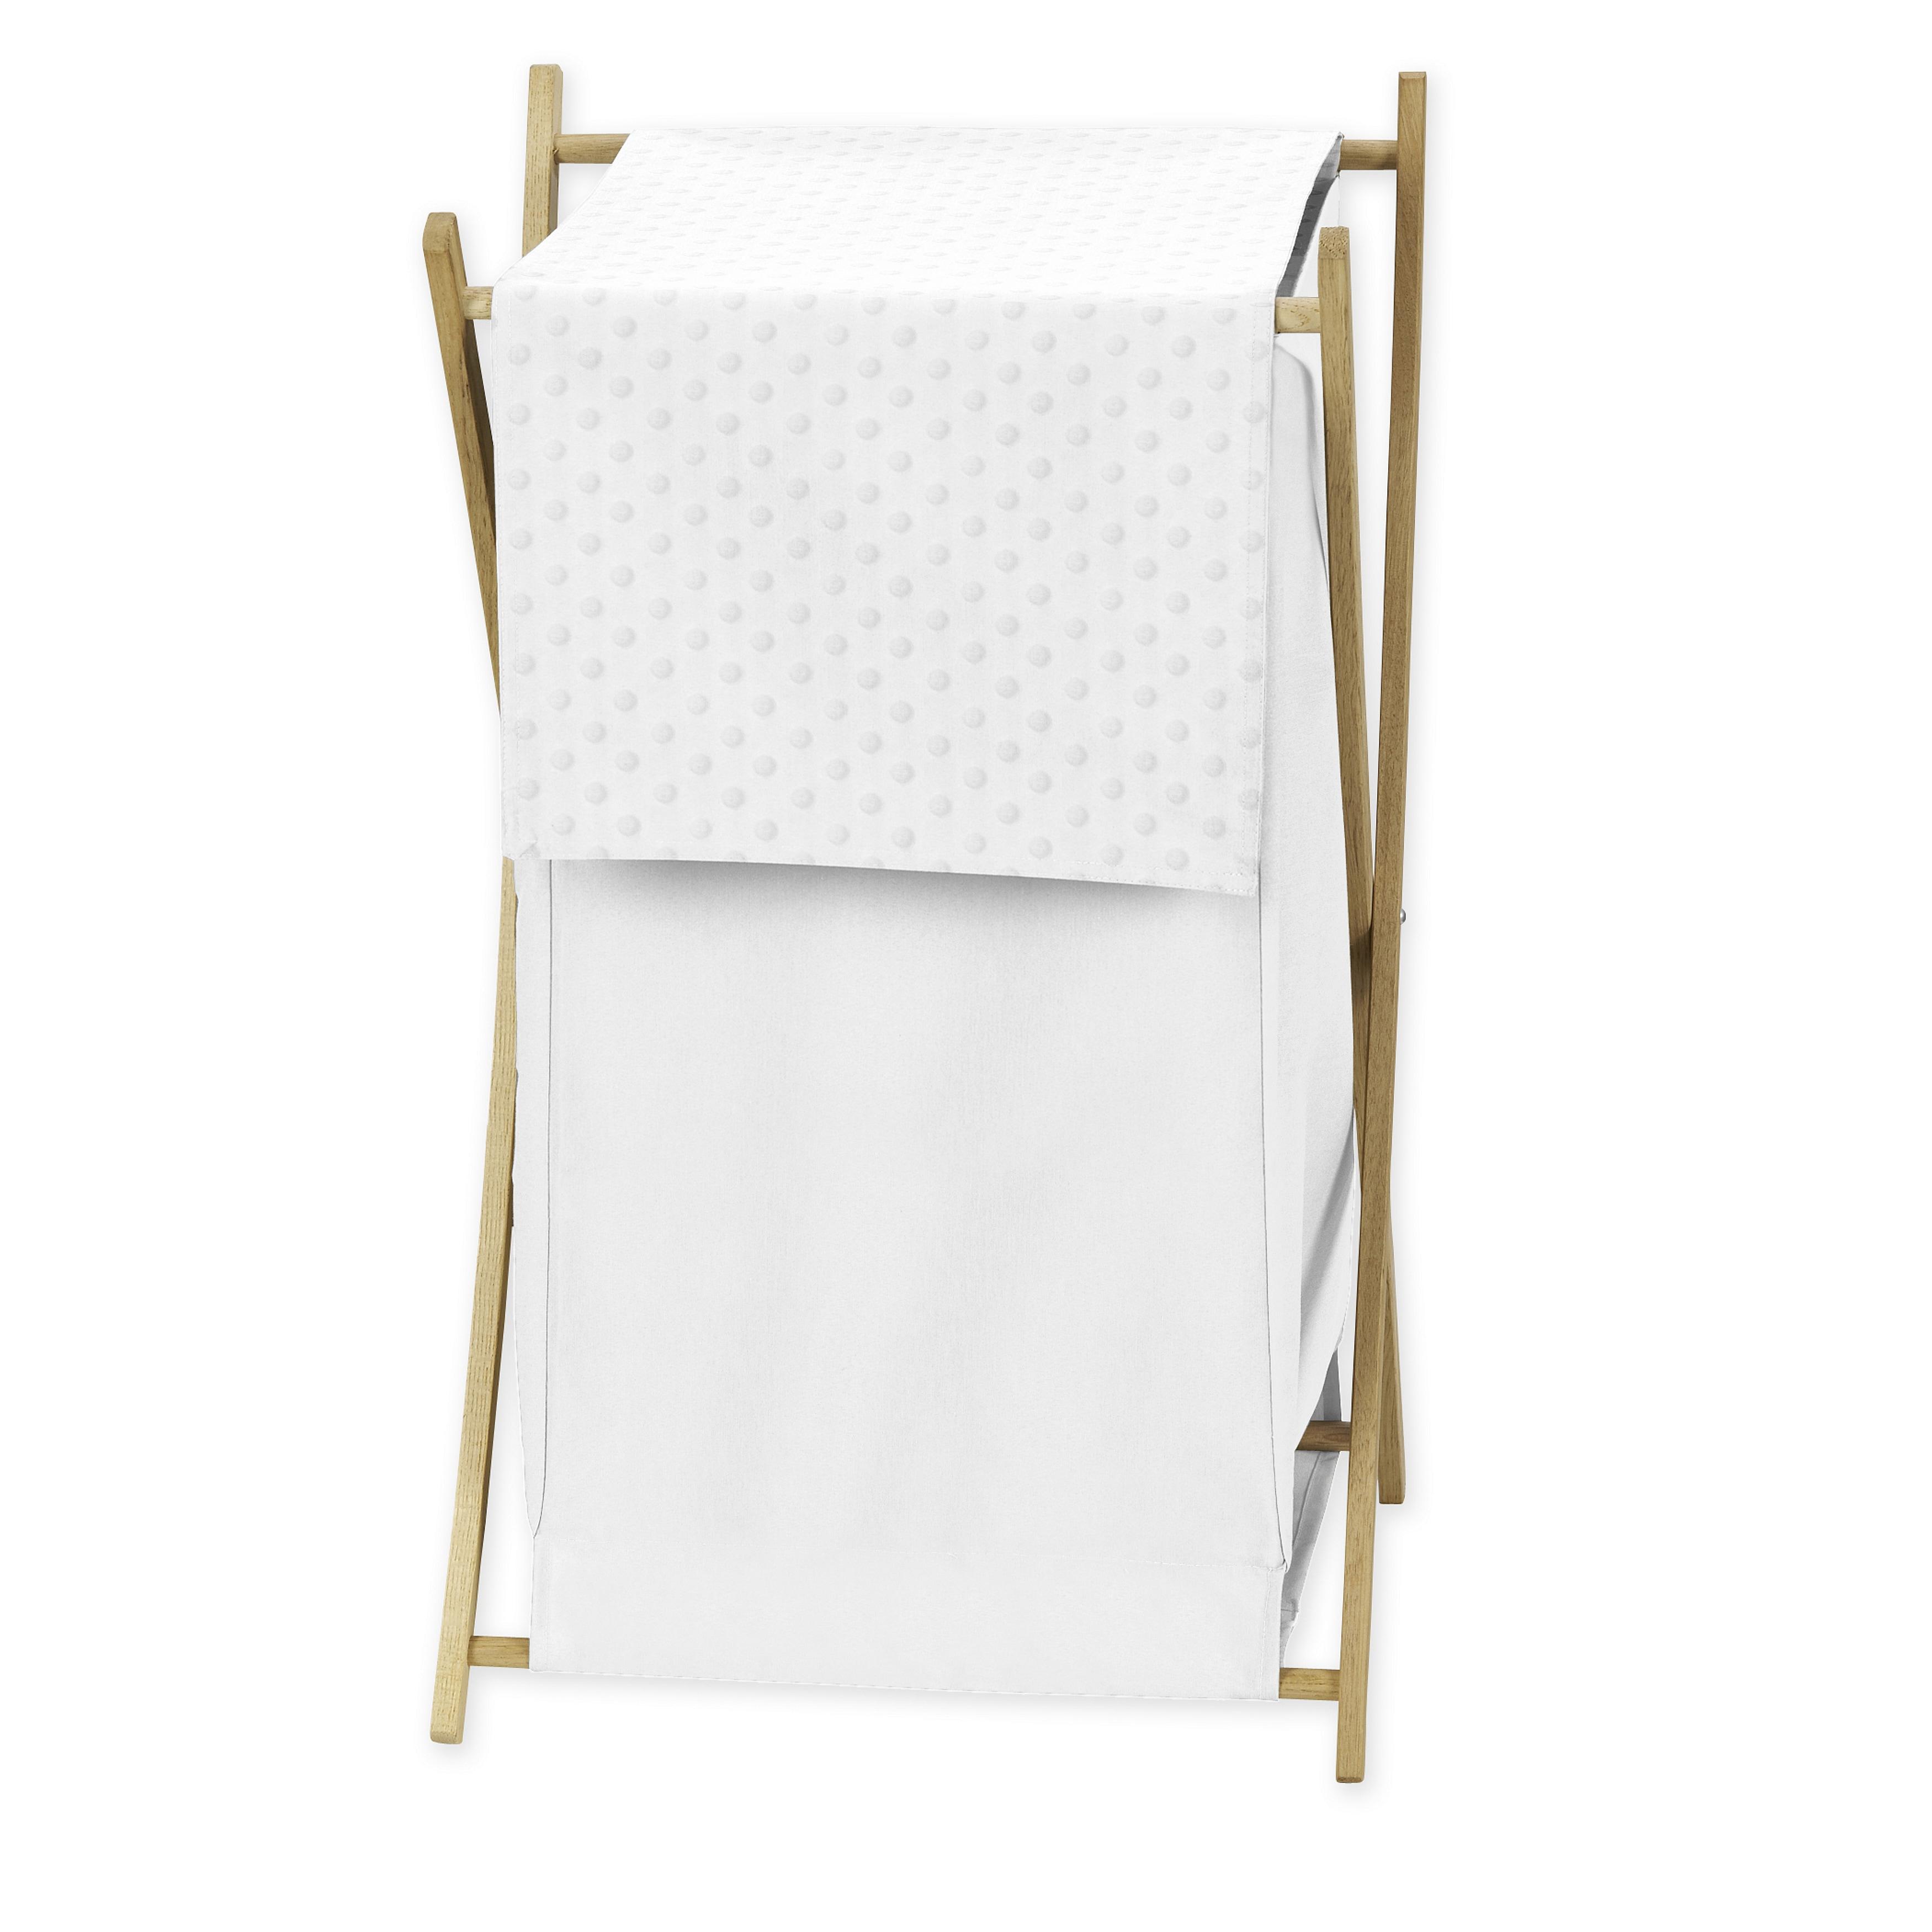 JoJo Designs White Minky Dot Collection Fabric 26.5-inch ...